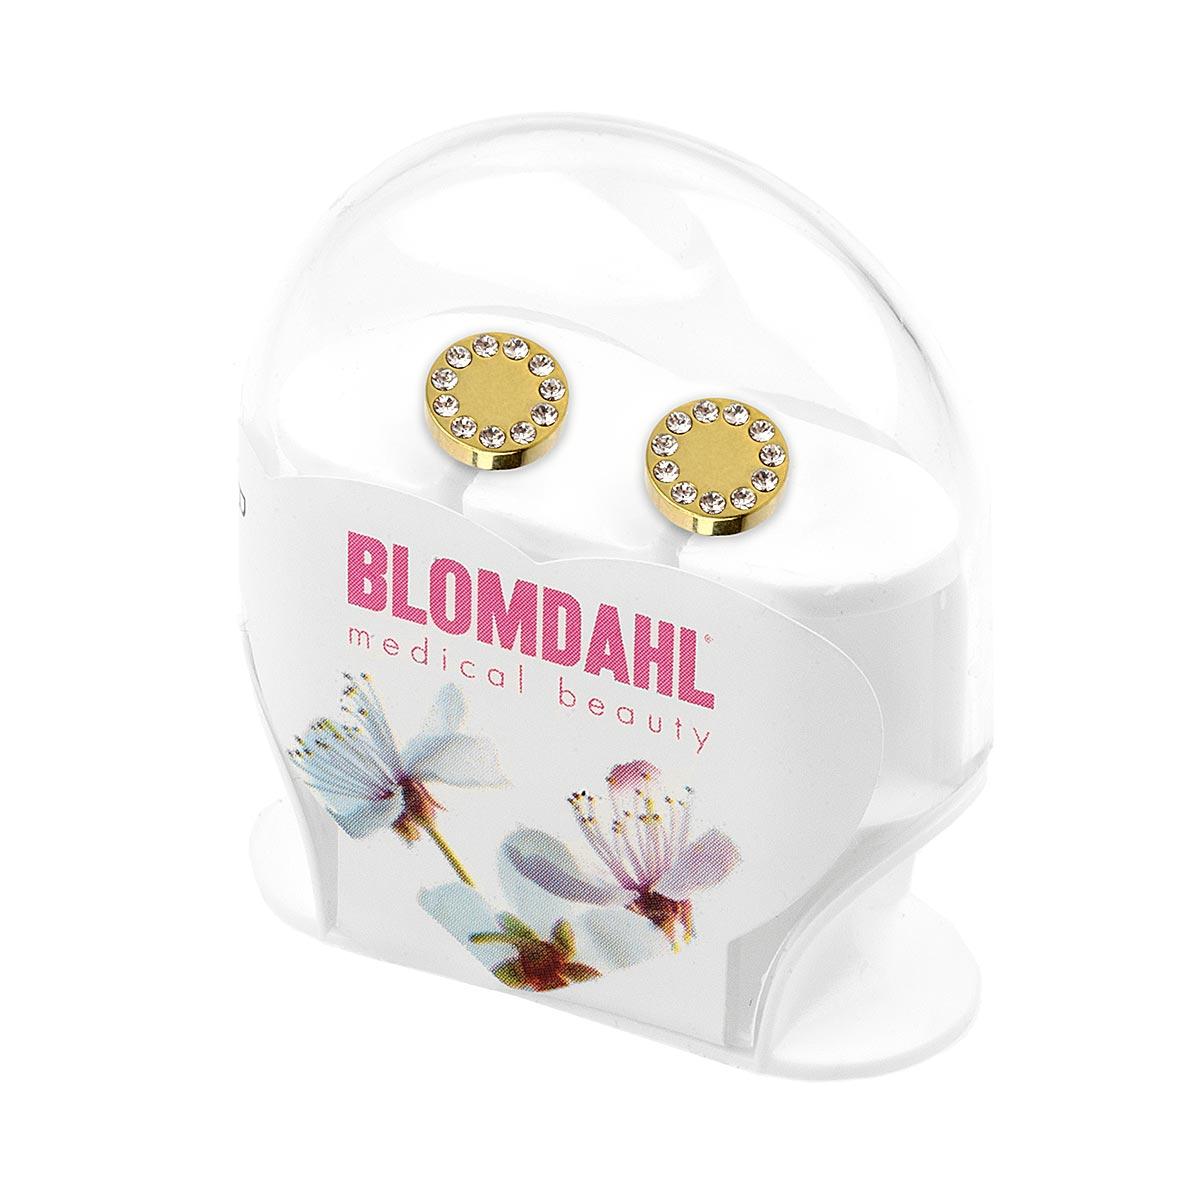 blomdahl-brilliance-puck-crystal-orhangen-guld-vit-2